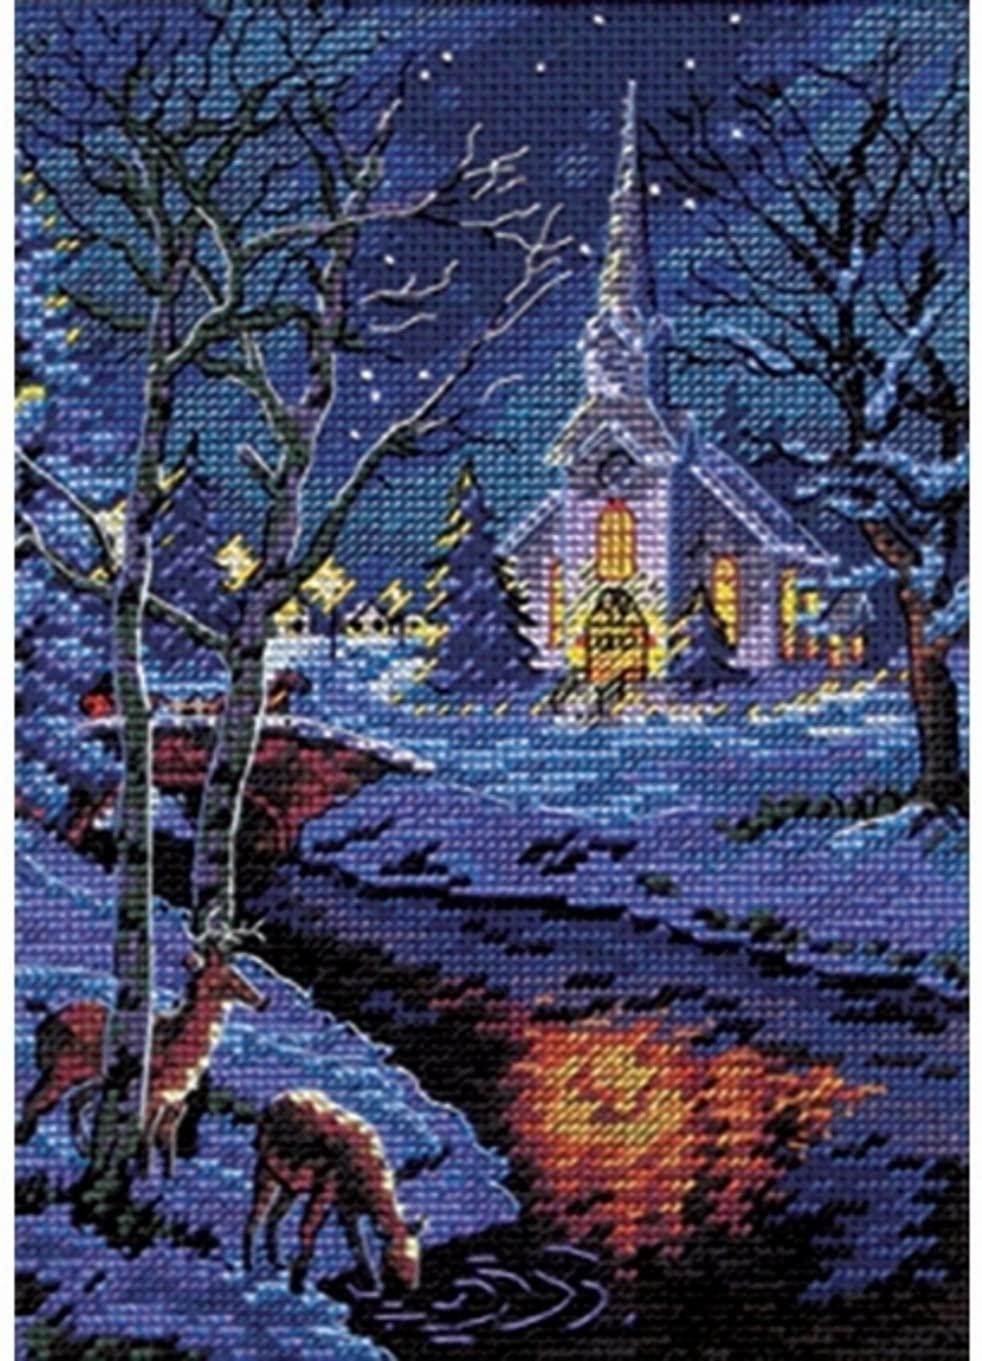 Splendor At Night - Cross Stitch Embroidery Scheme